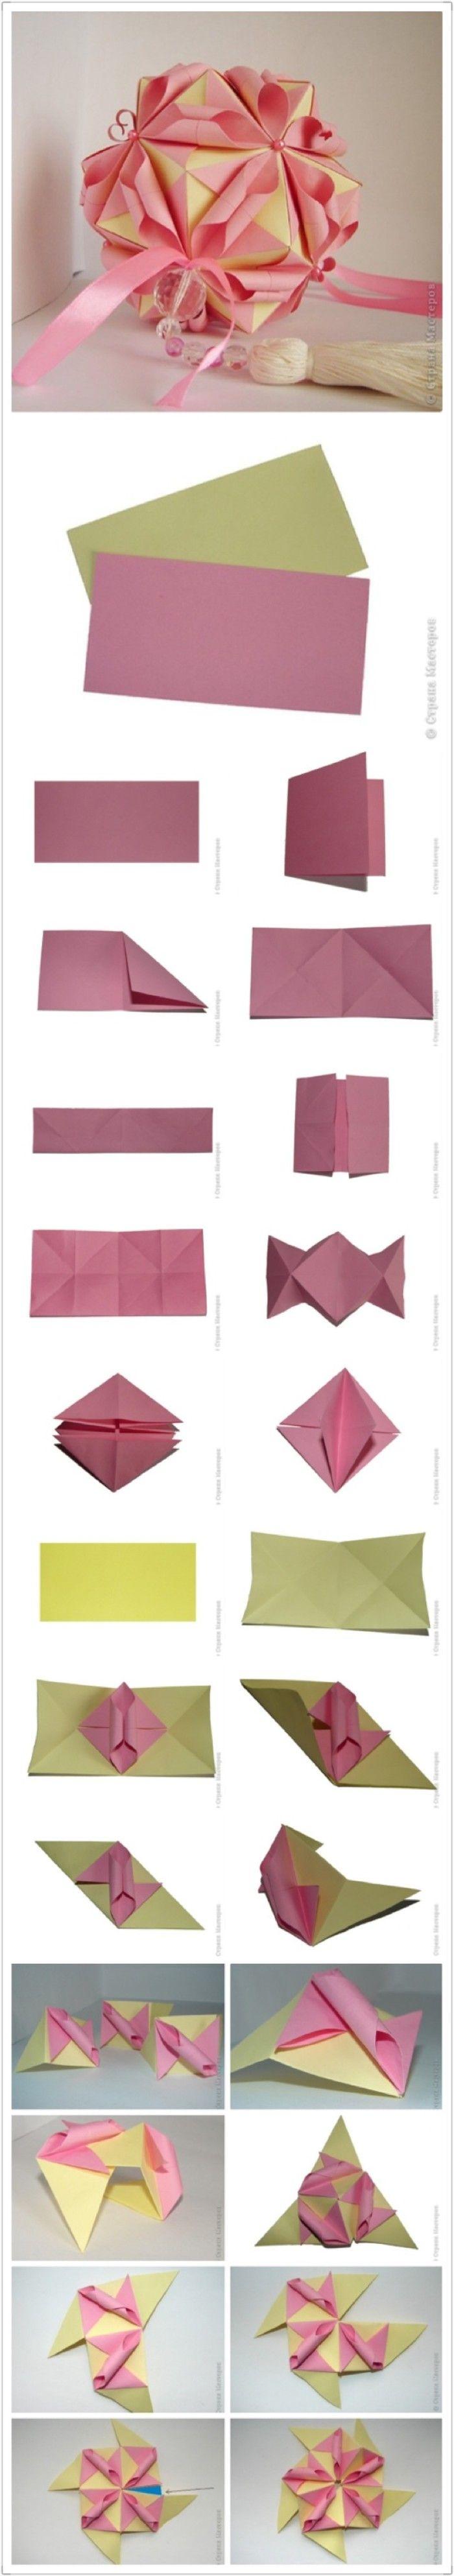 Flamenko Star Folding Directions Craft Ideas T Origami Kusudama Diagrams